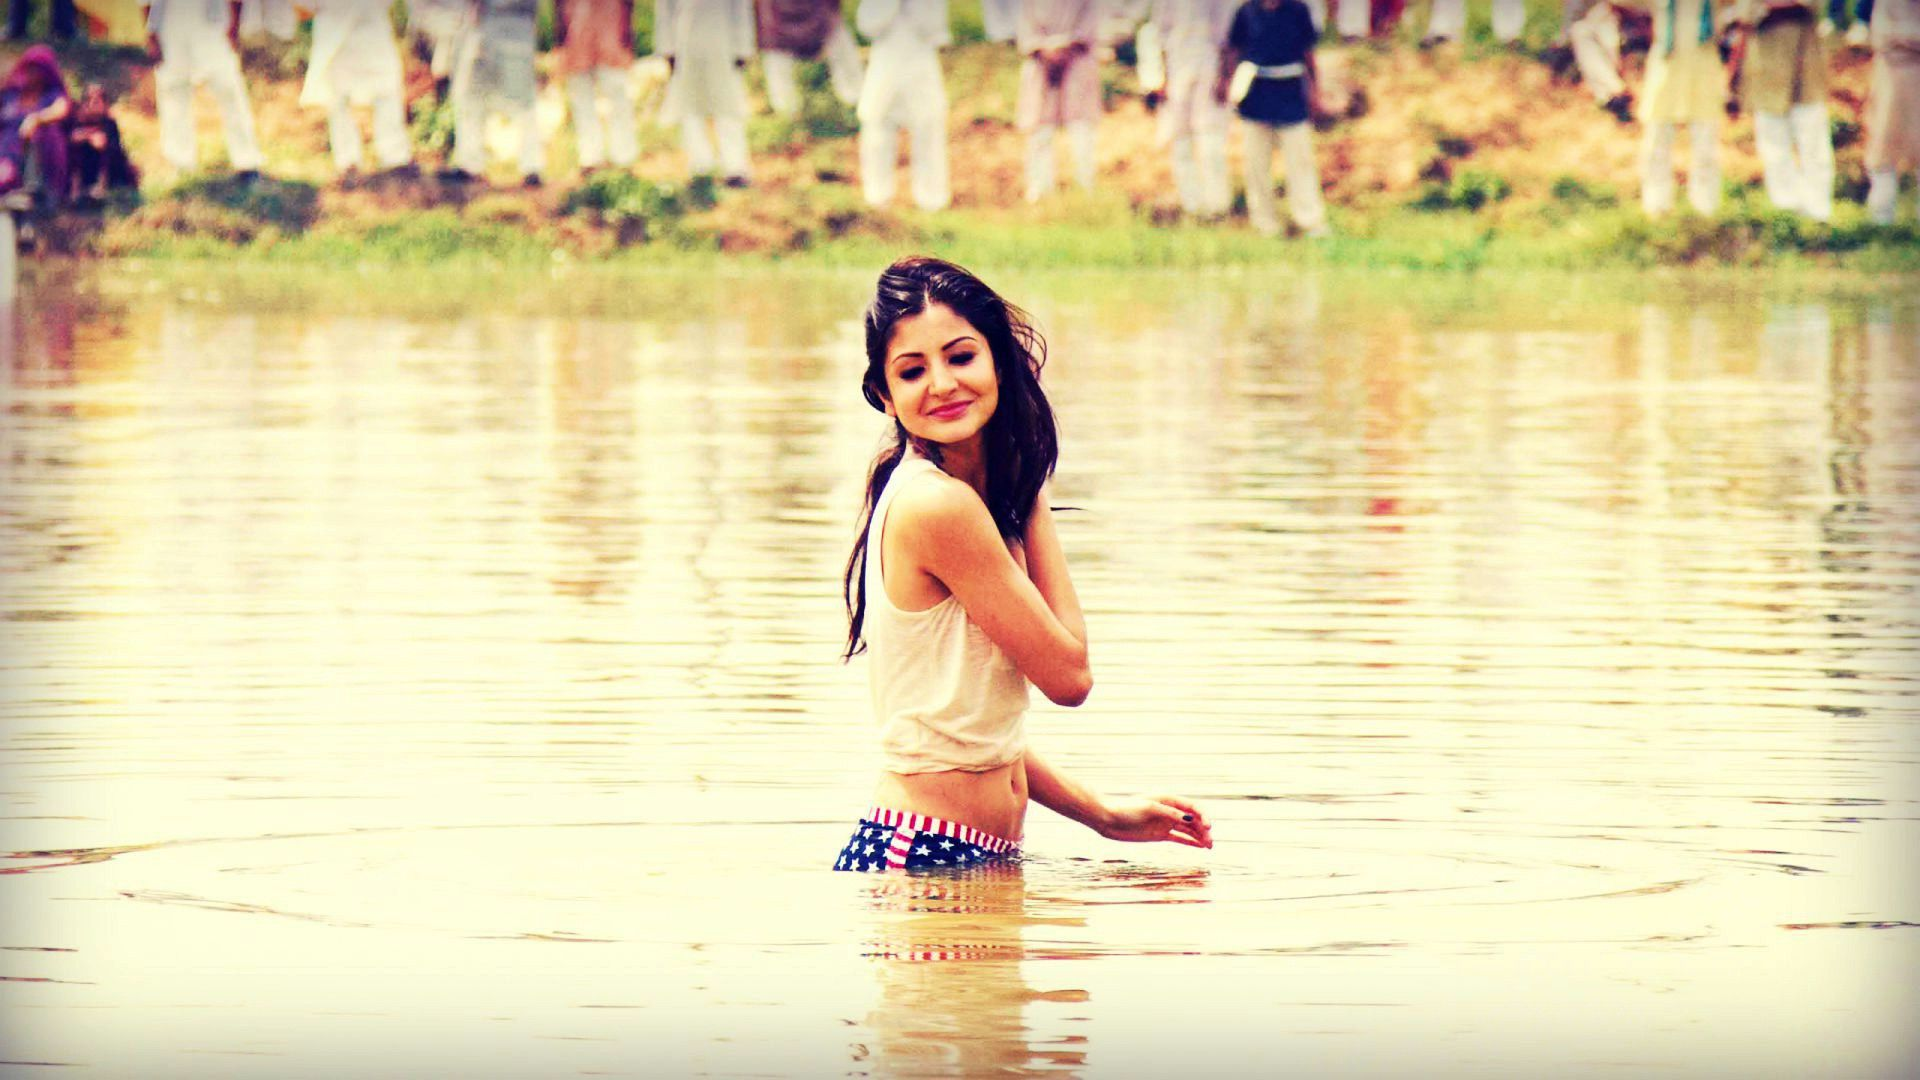 Anushka Sharma | Saree models, Saree designs, Anushka sharma